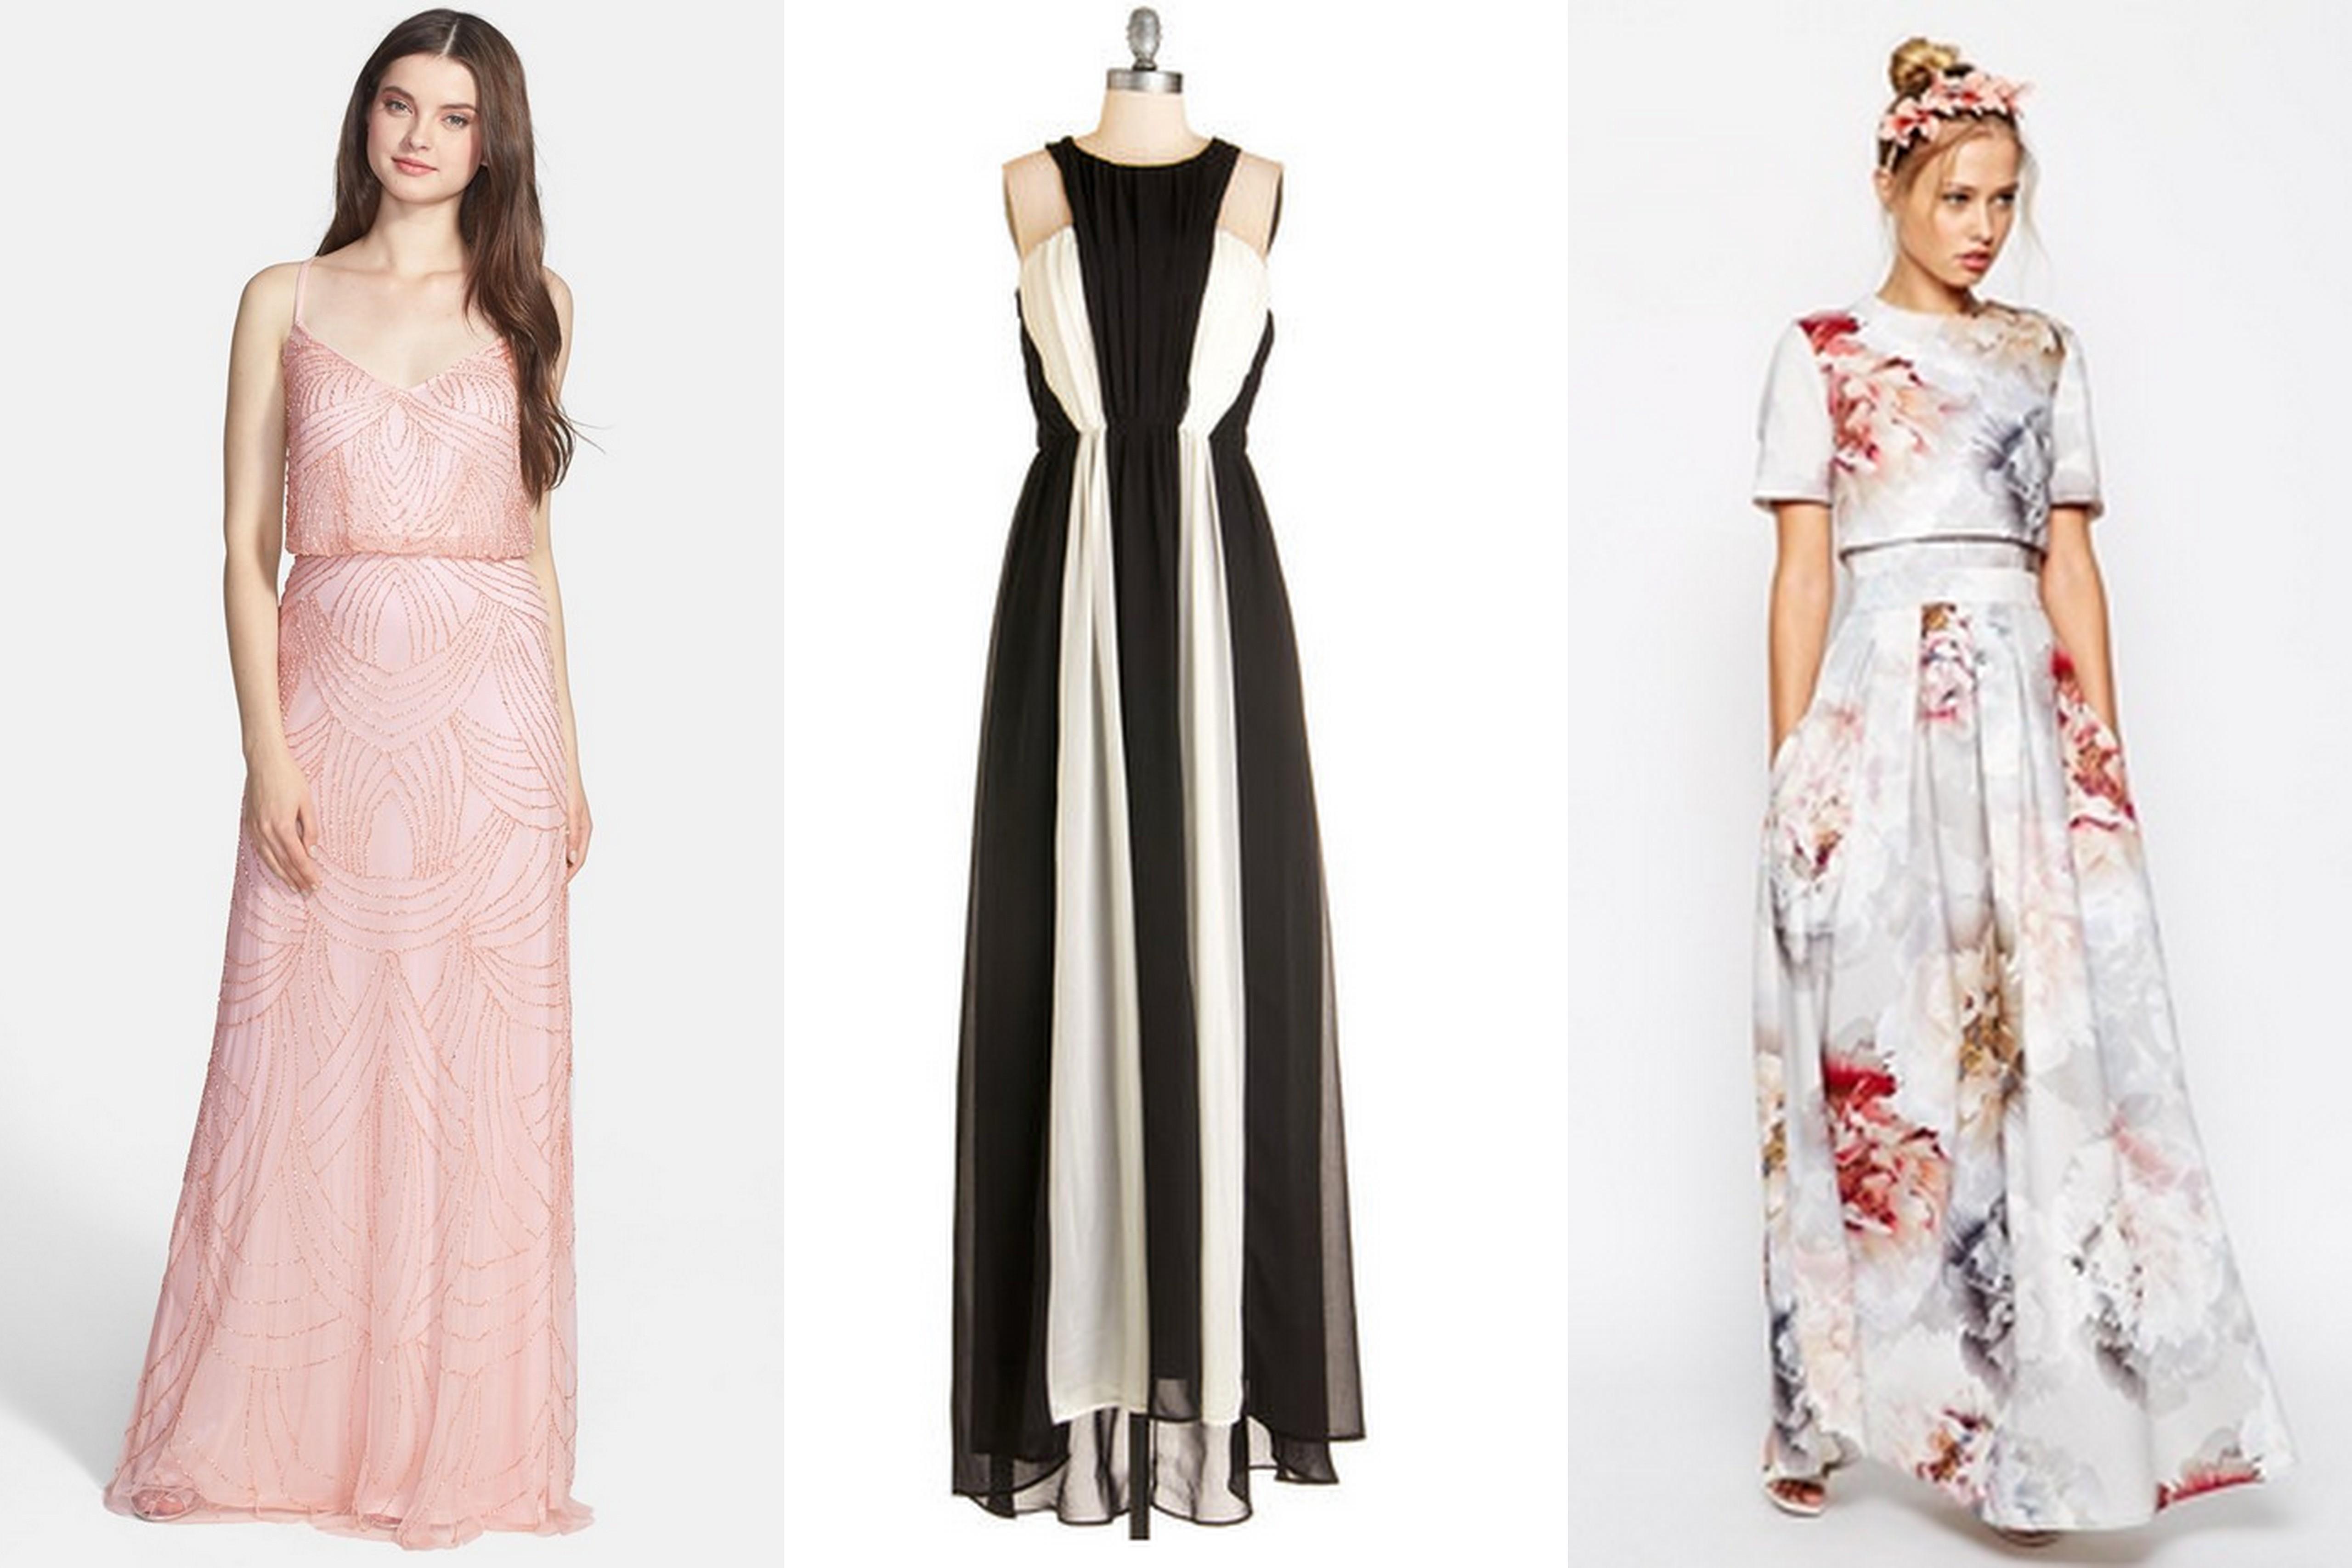 Wear: What to Wear This Wedding Season